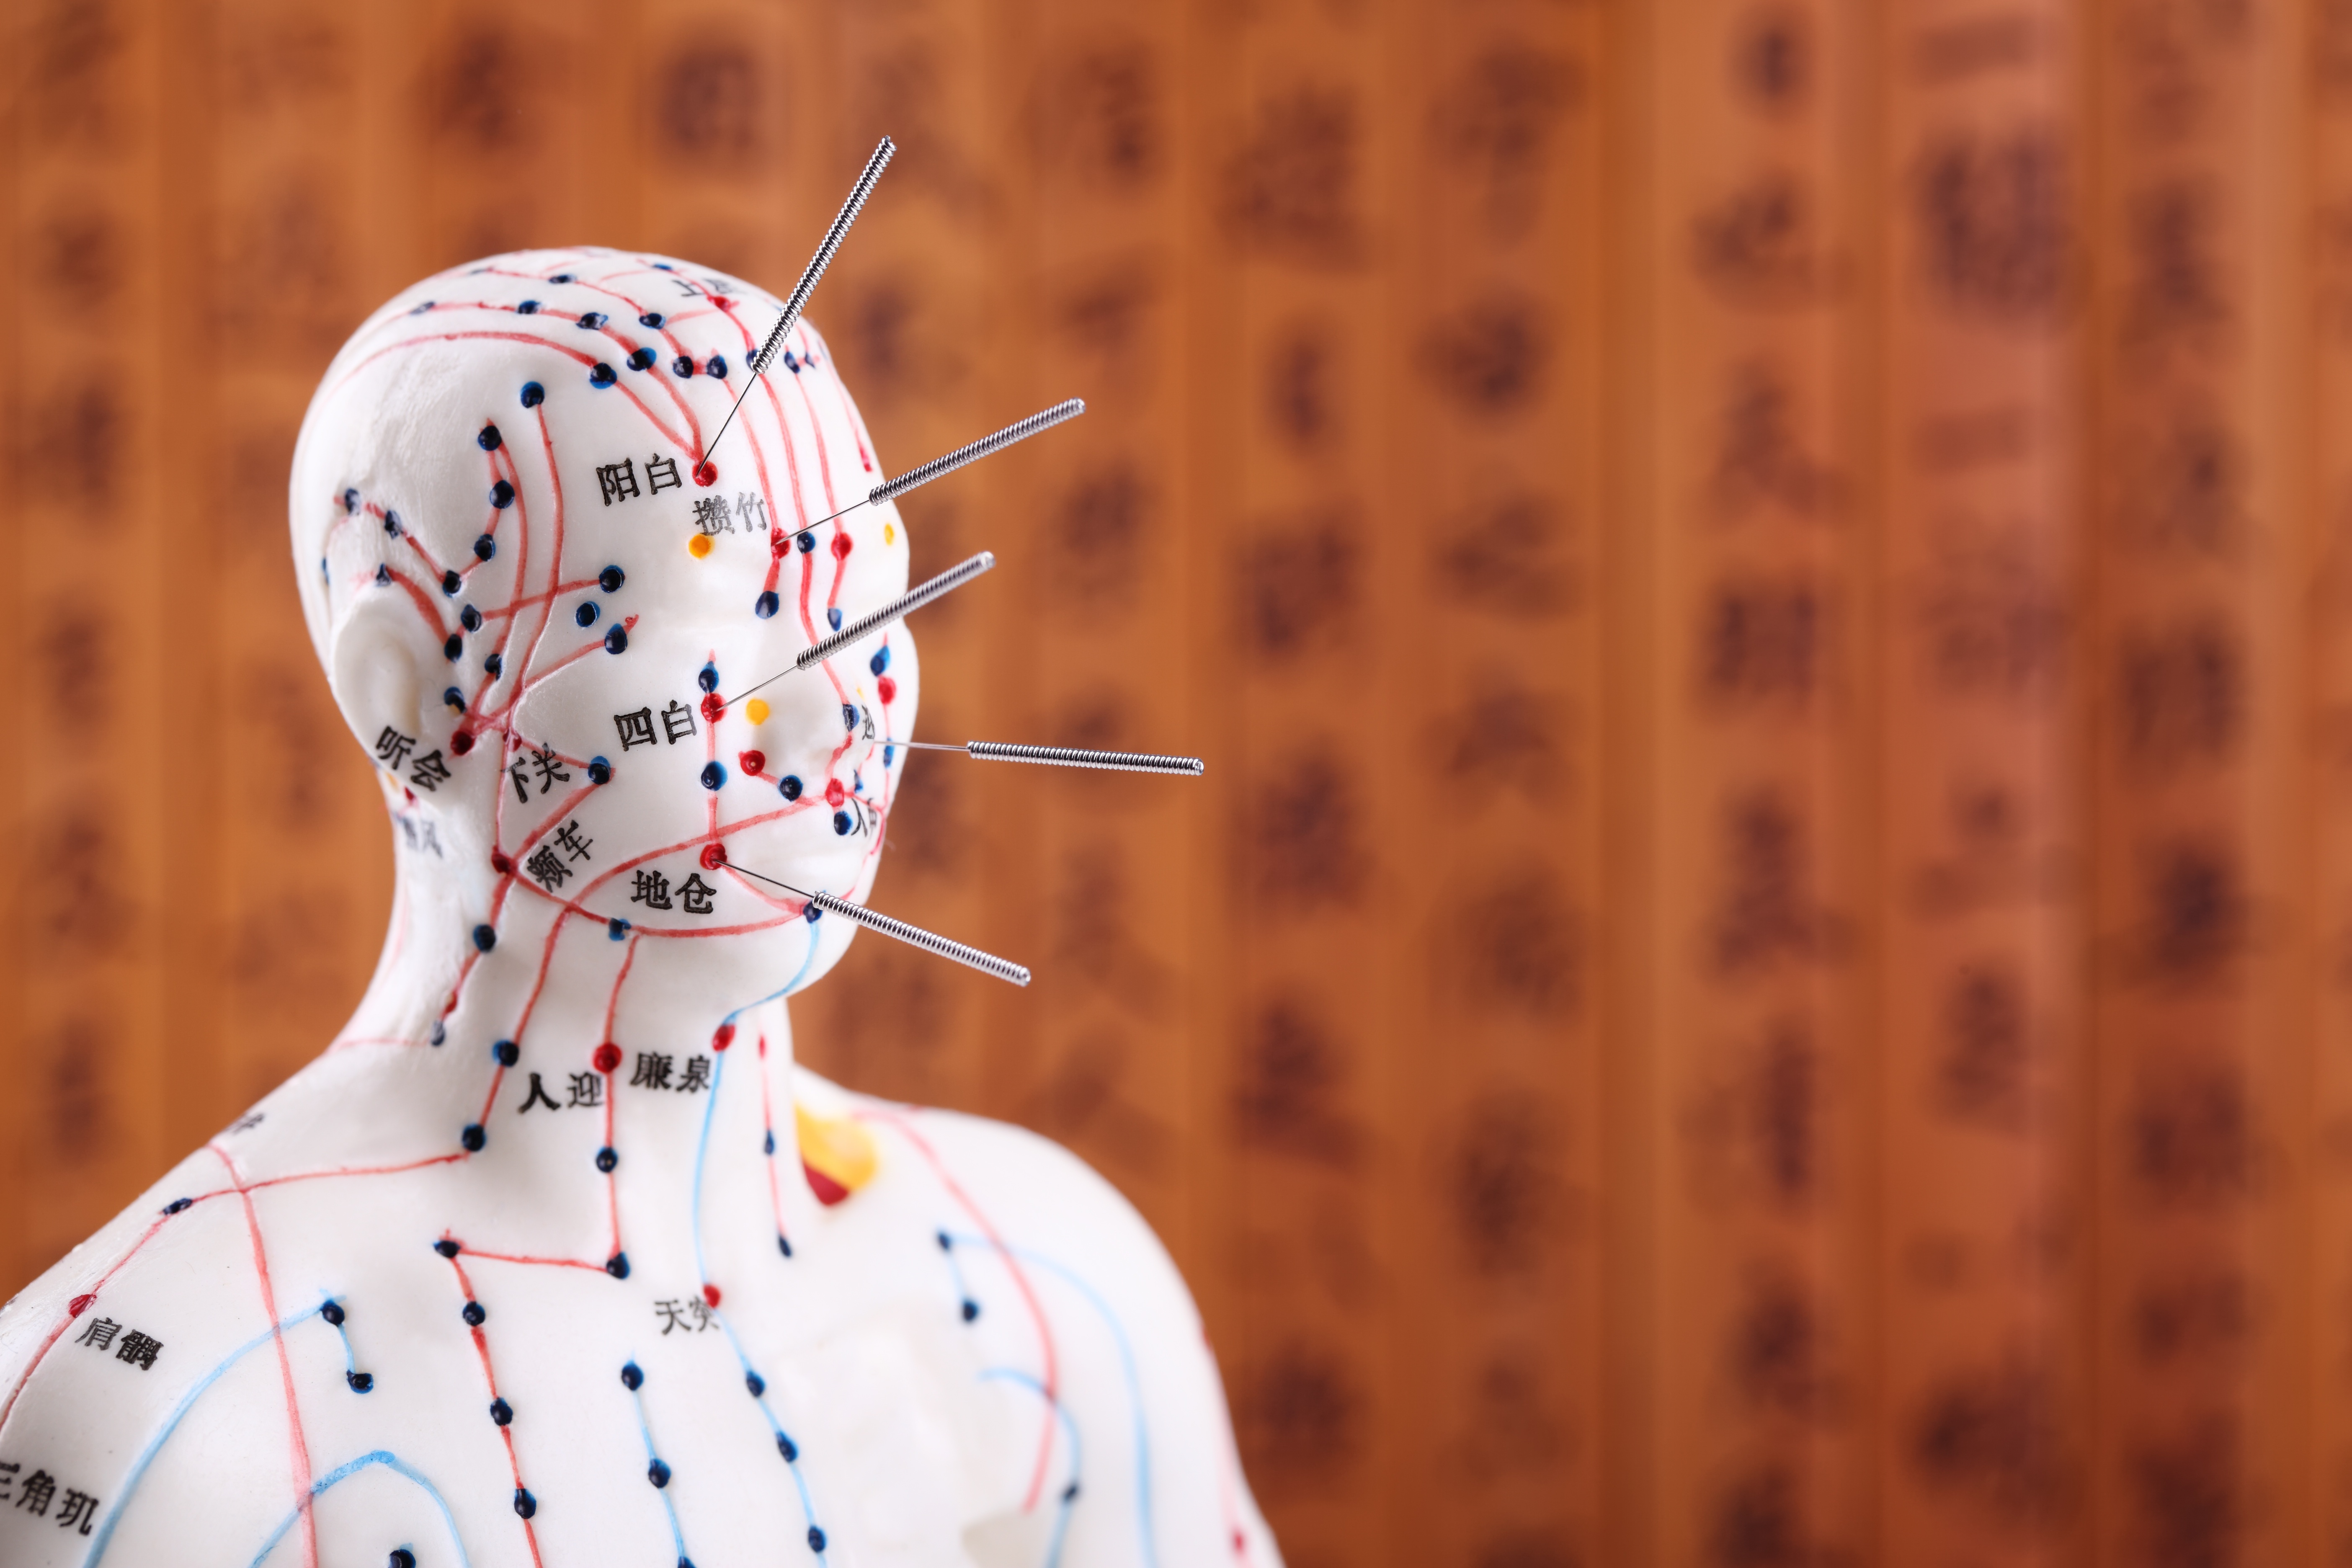 AcupunctureSchool